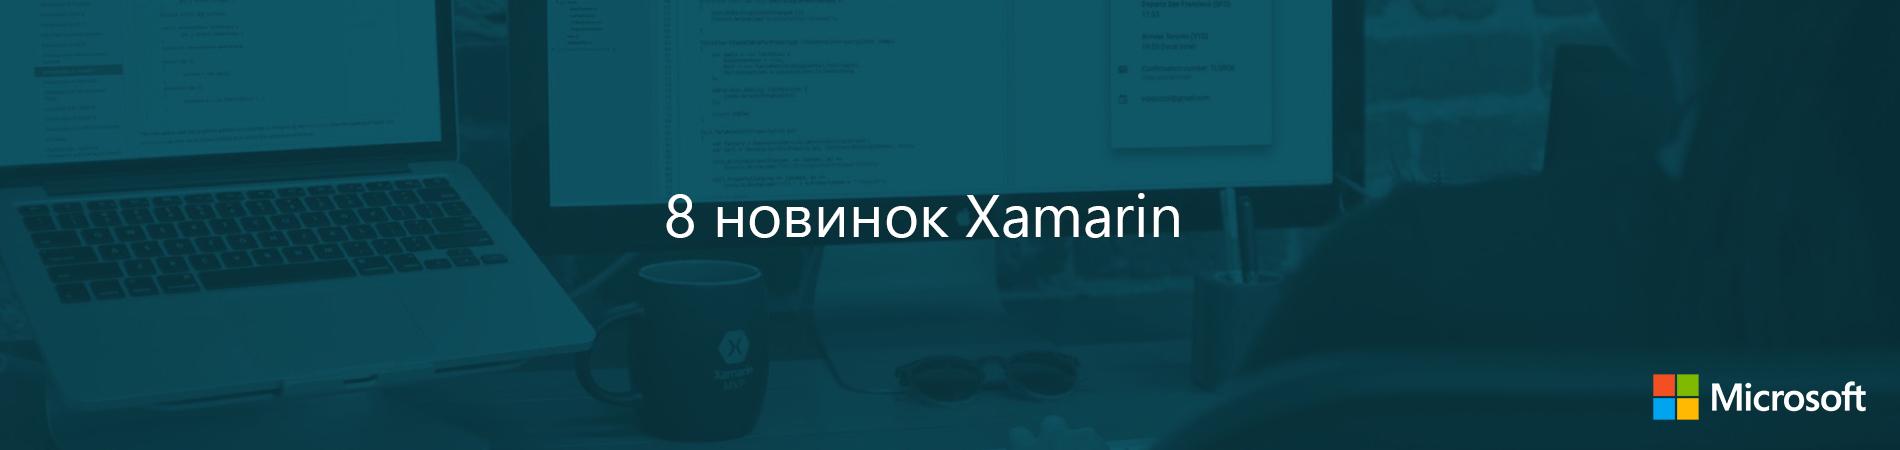 8 новинок Xamarin